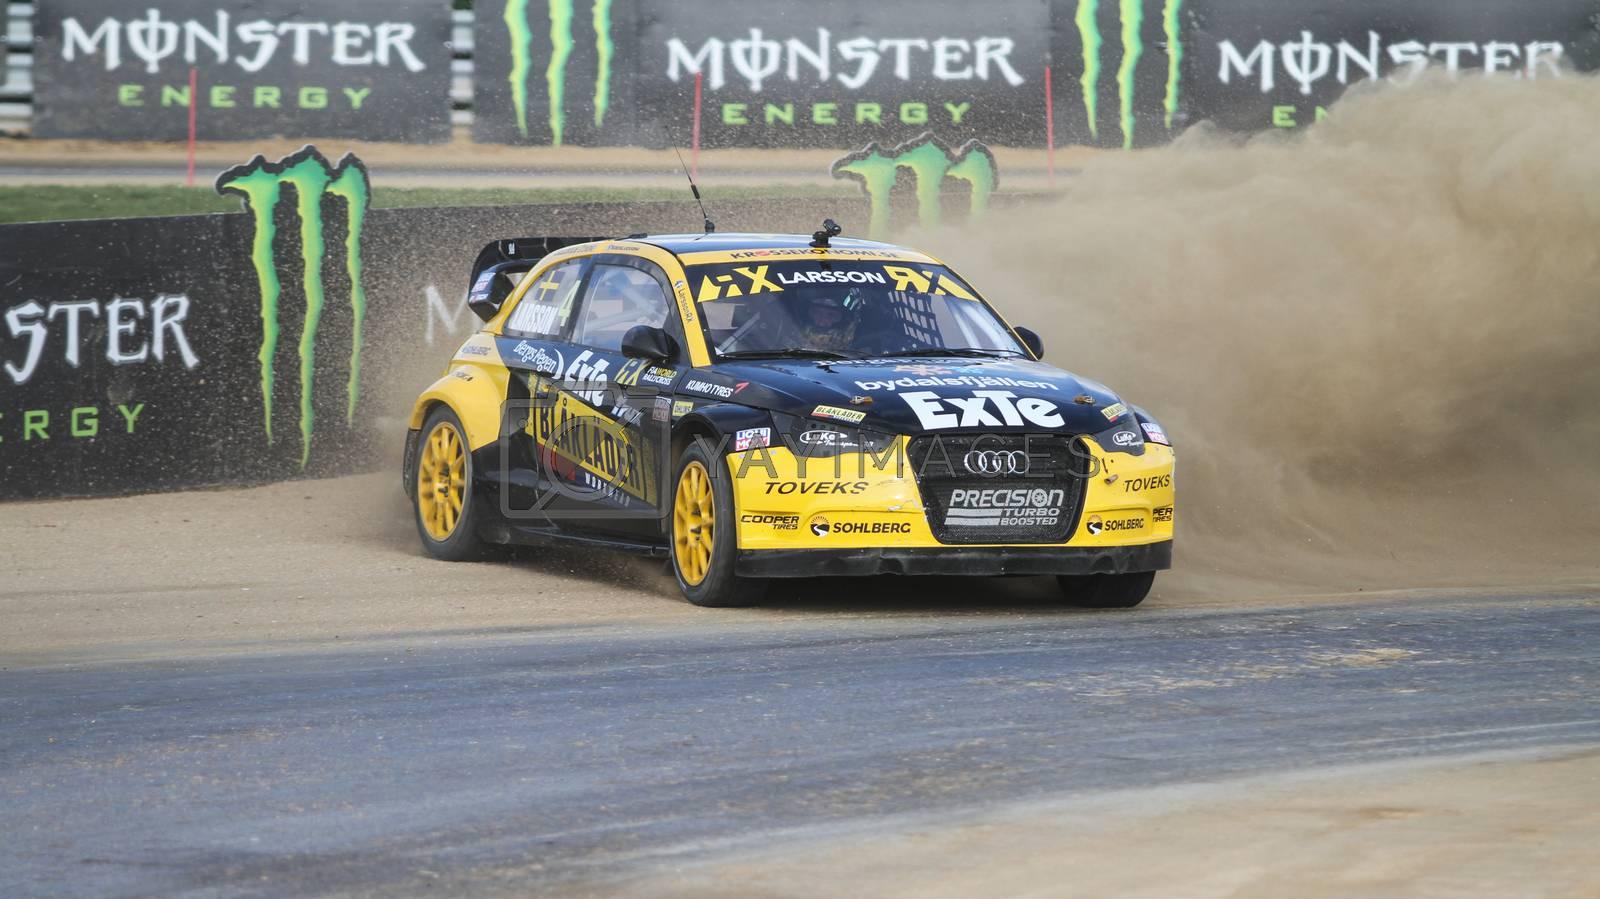 ISTANBUL, TURKEY - OCTOBER 03, 2015: Robin Larsson drives Audi A1 in FIA World Rallycross Championship.